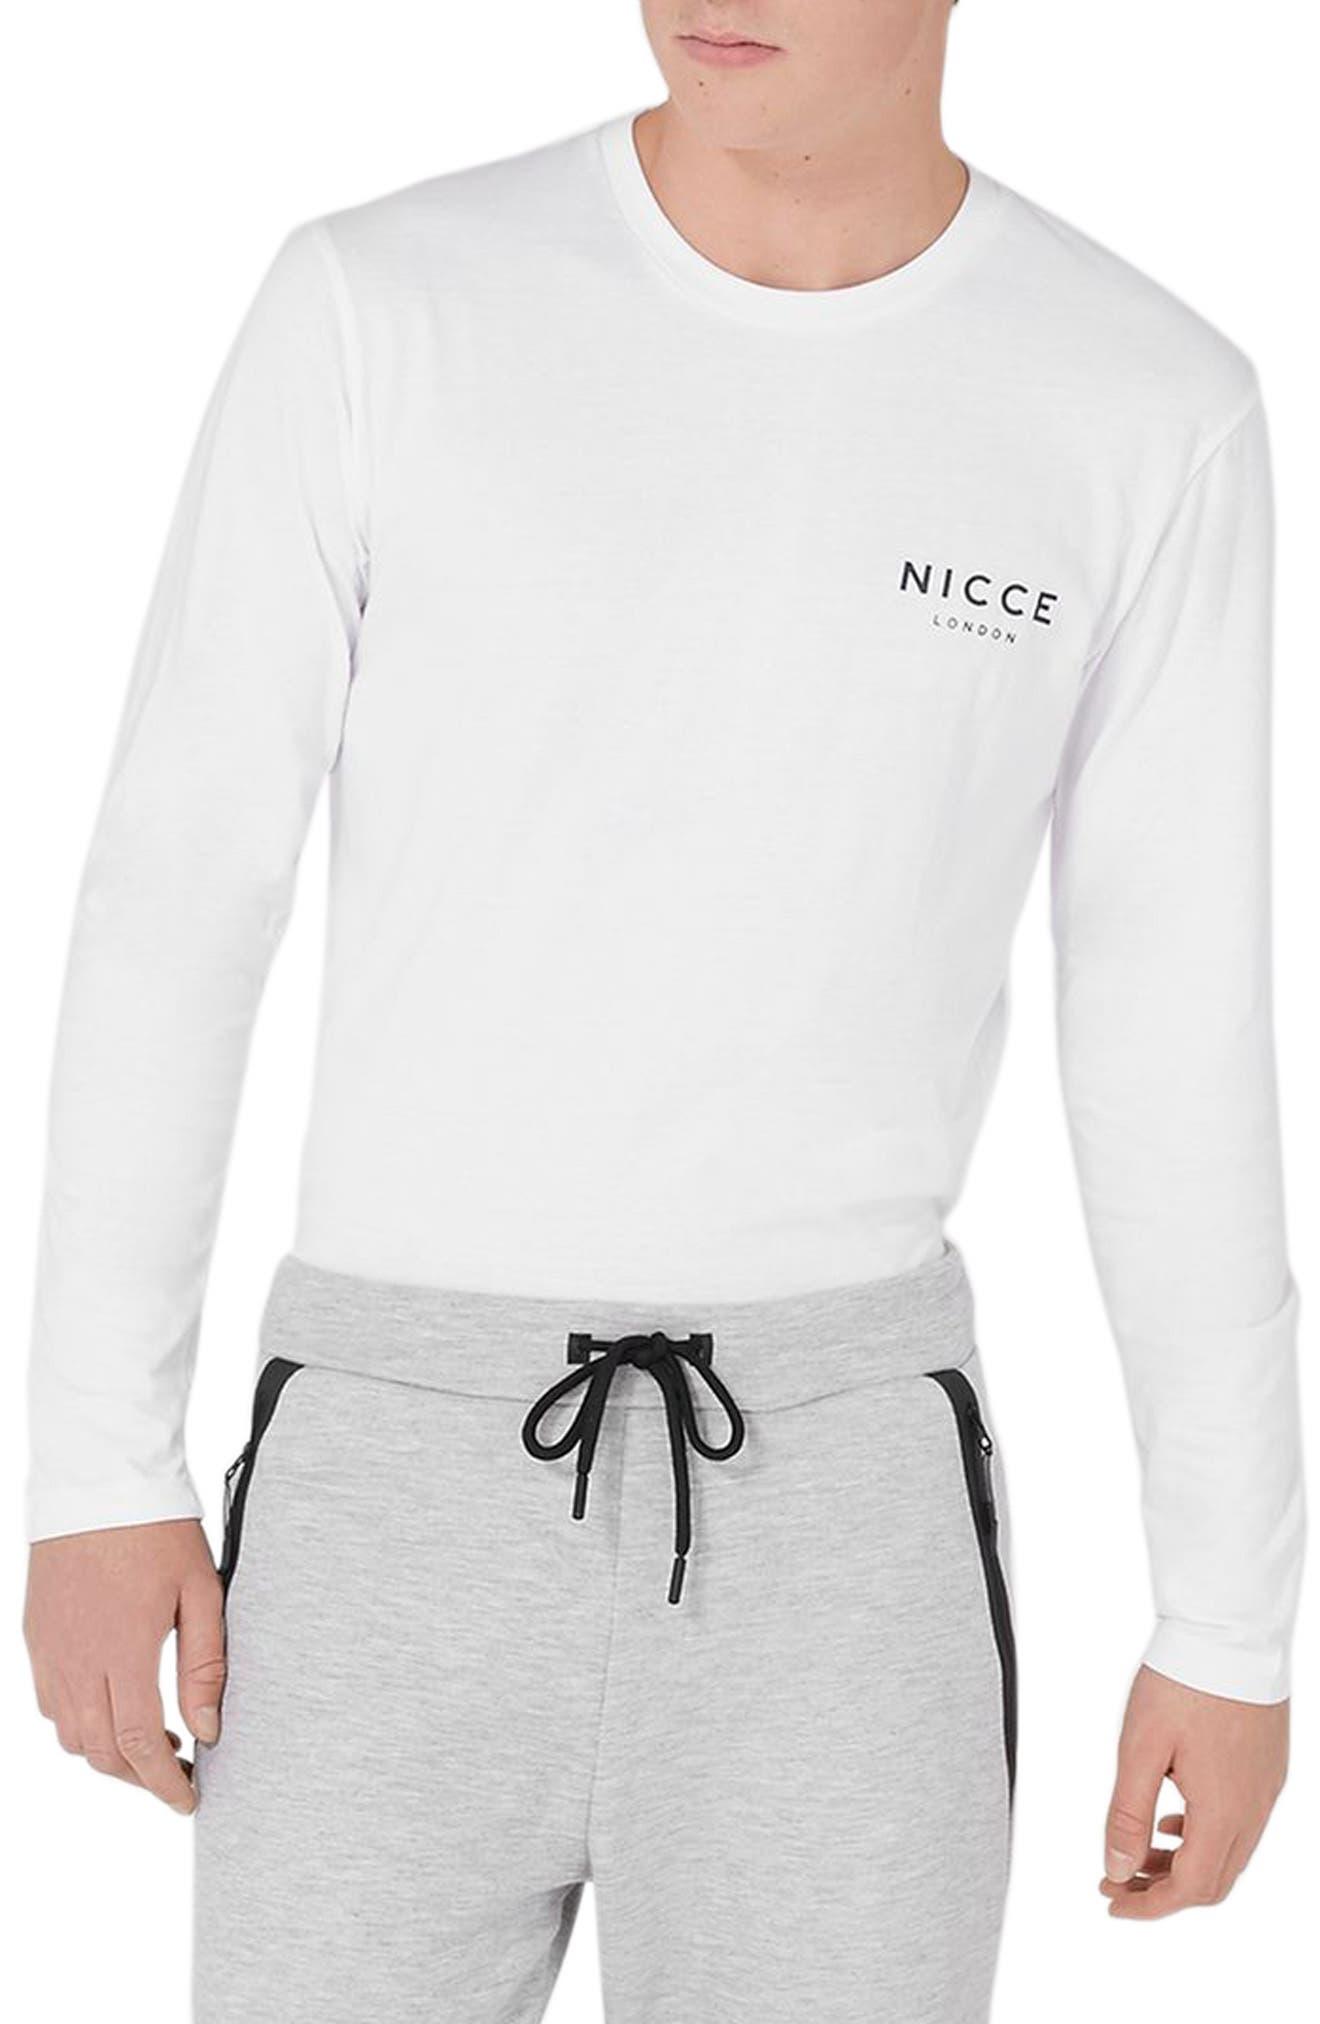 NICCE Graphic Long Sleeve T-Shirt,                             Main thumbnail 1, color,                             100